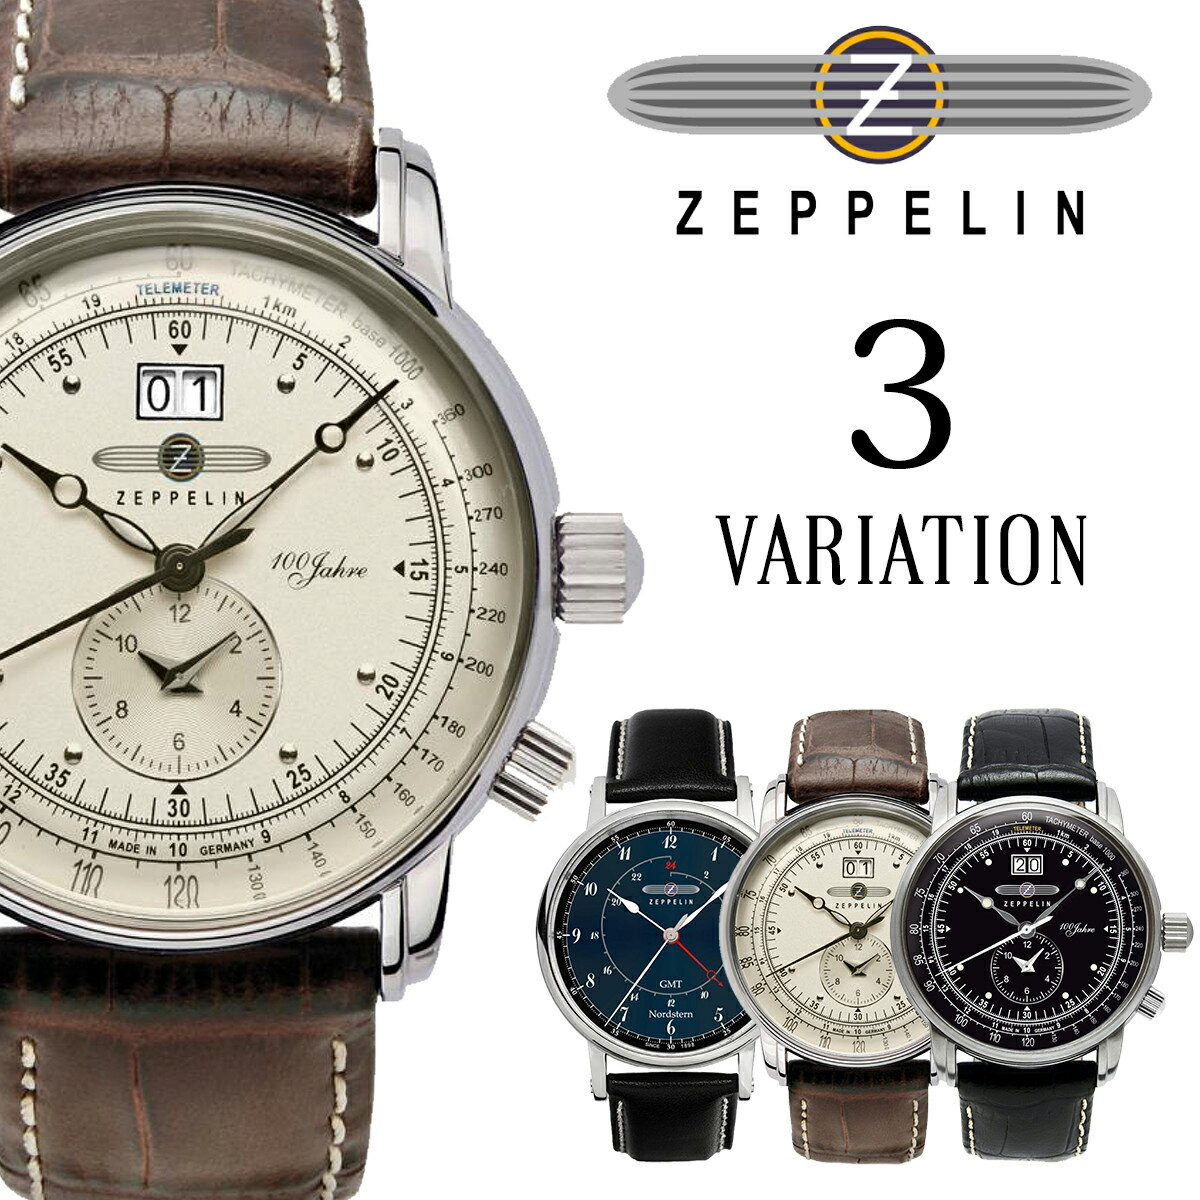 ZEPPELIN ツェッペリン 7640-1 7640-2 7546-3 メンズ 時計 腕時計 プレゼント ギフト 贈り物